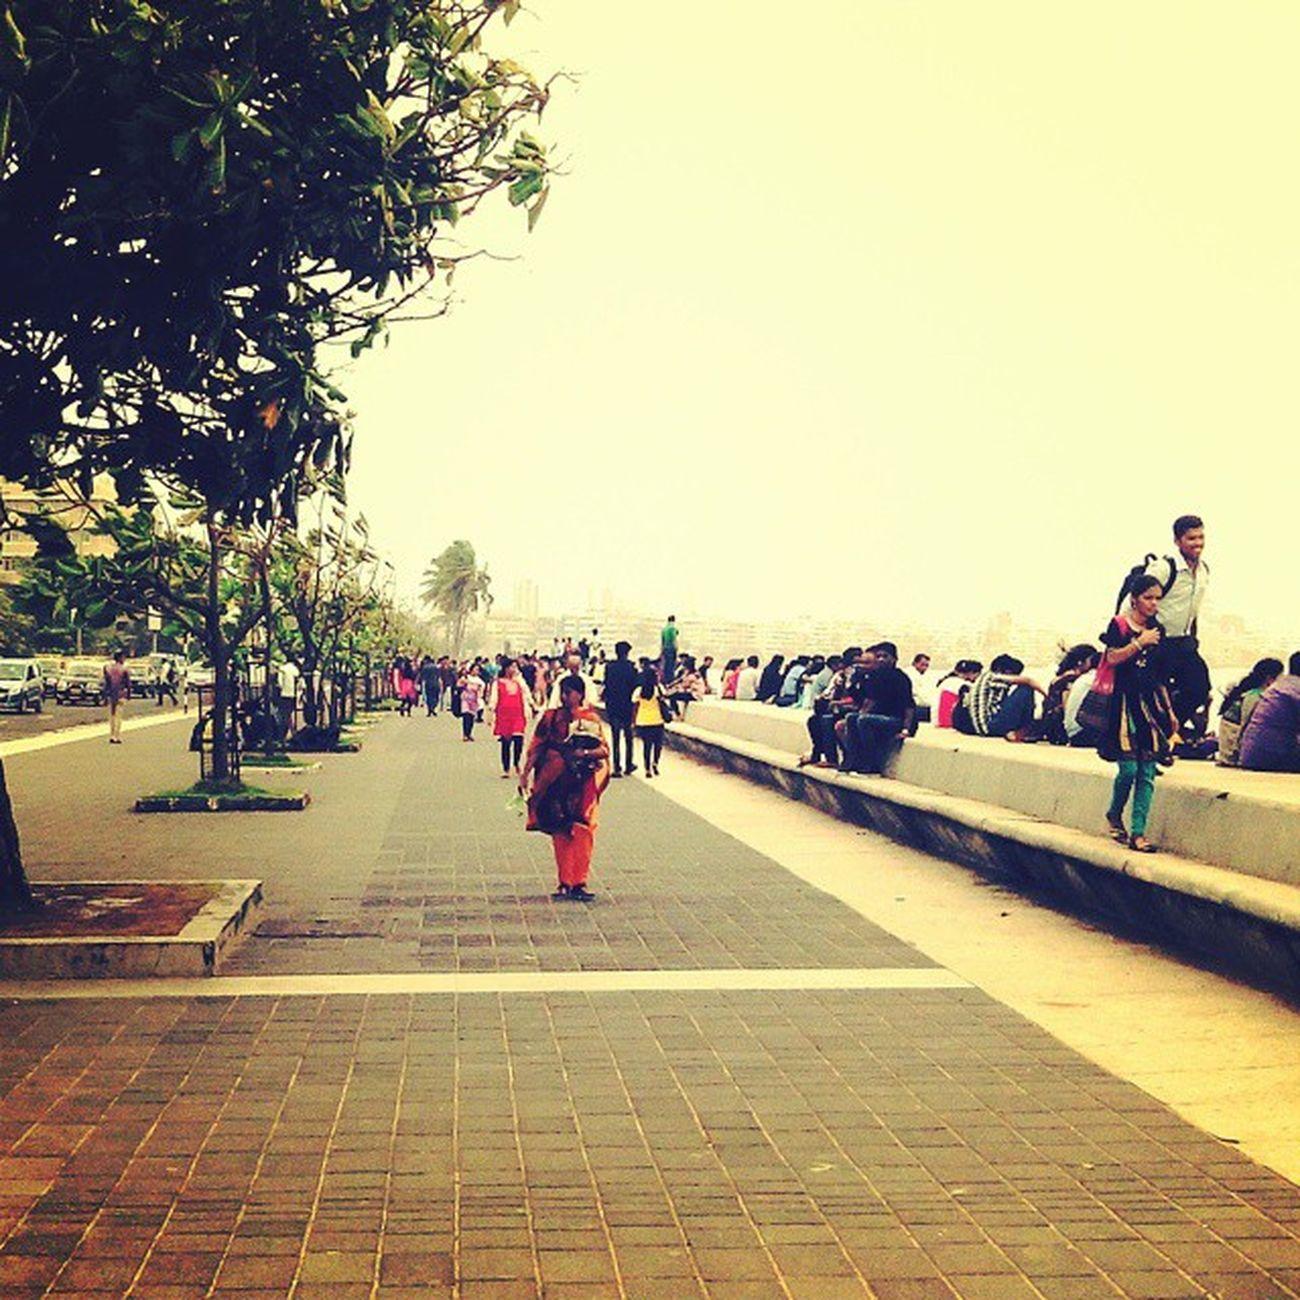 Missing Those  Streets Mumbai Marinedrive Crowd Couples Weather Evening Mumbai Itis  Instamood Instamemories Instashare